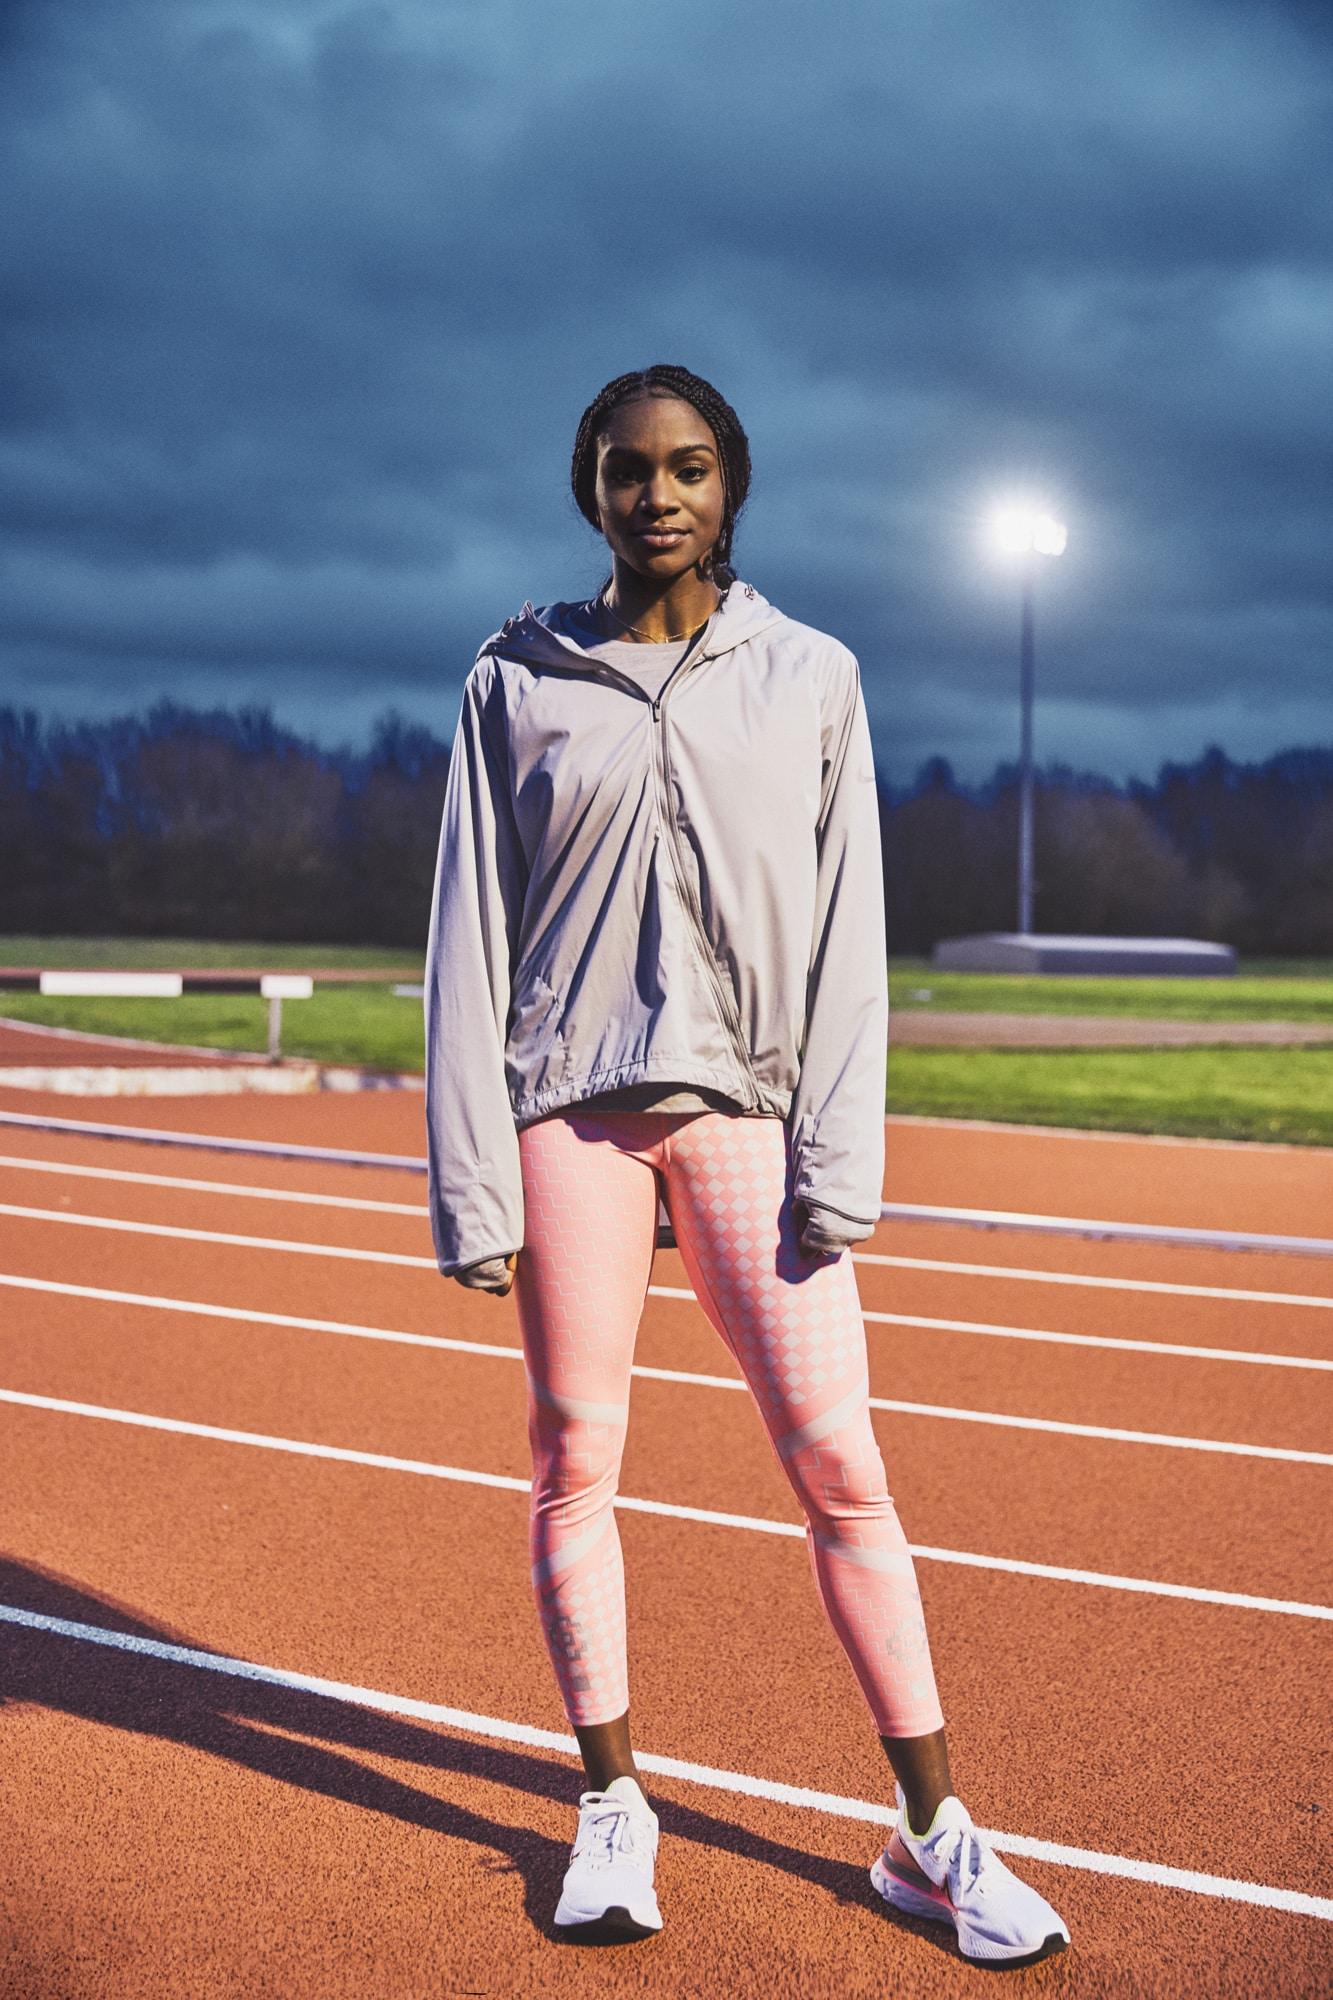 Dina-Asher-Smith-Nike-React-Infinity-Run-Runpack-Tokyo-6